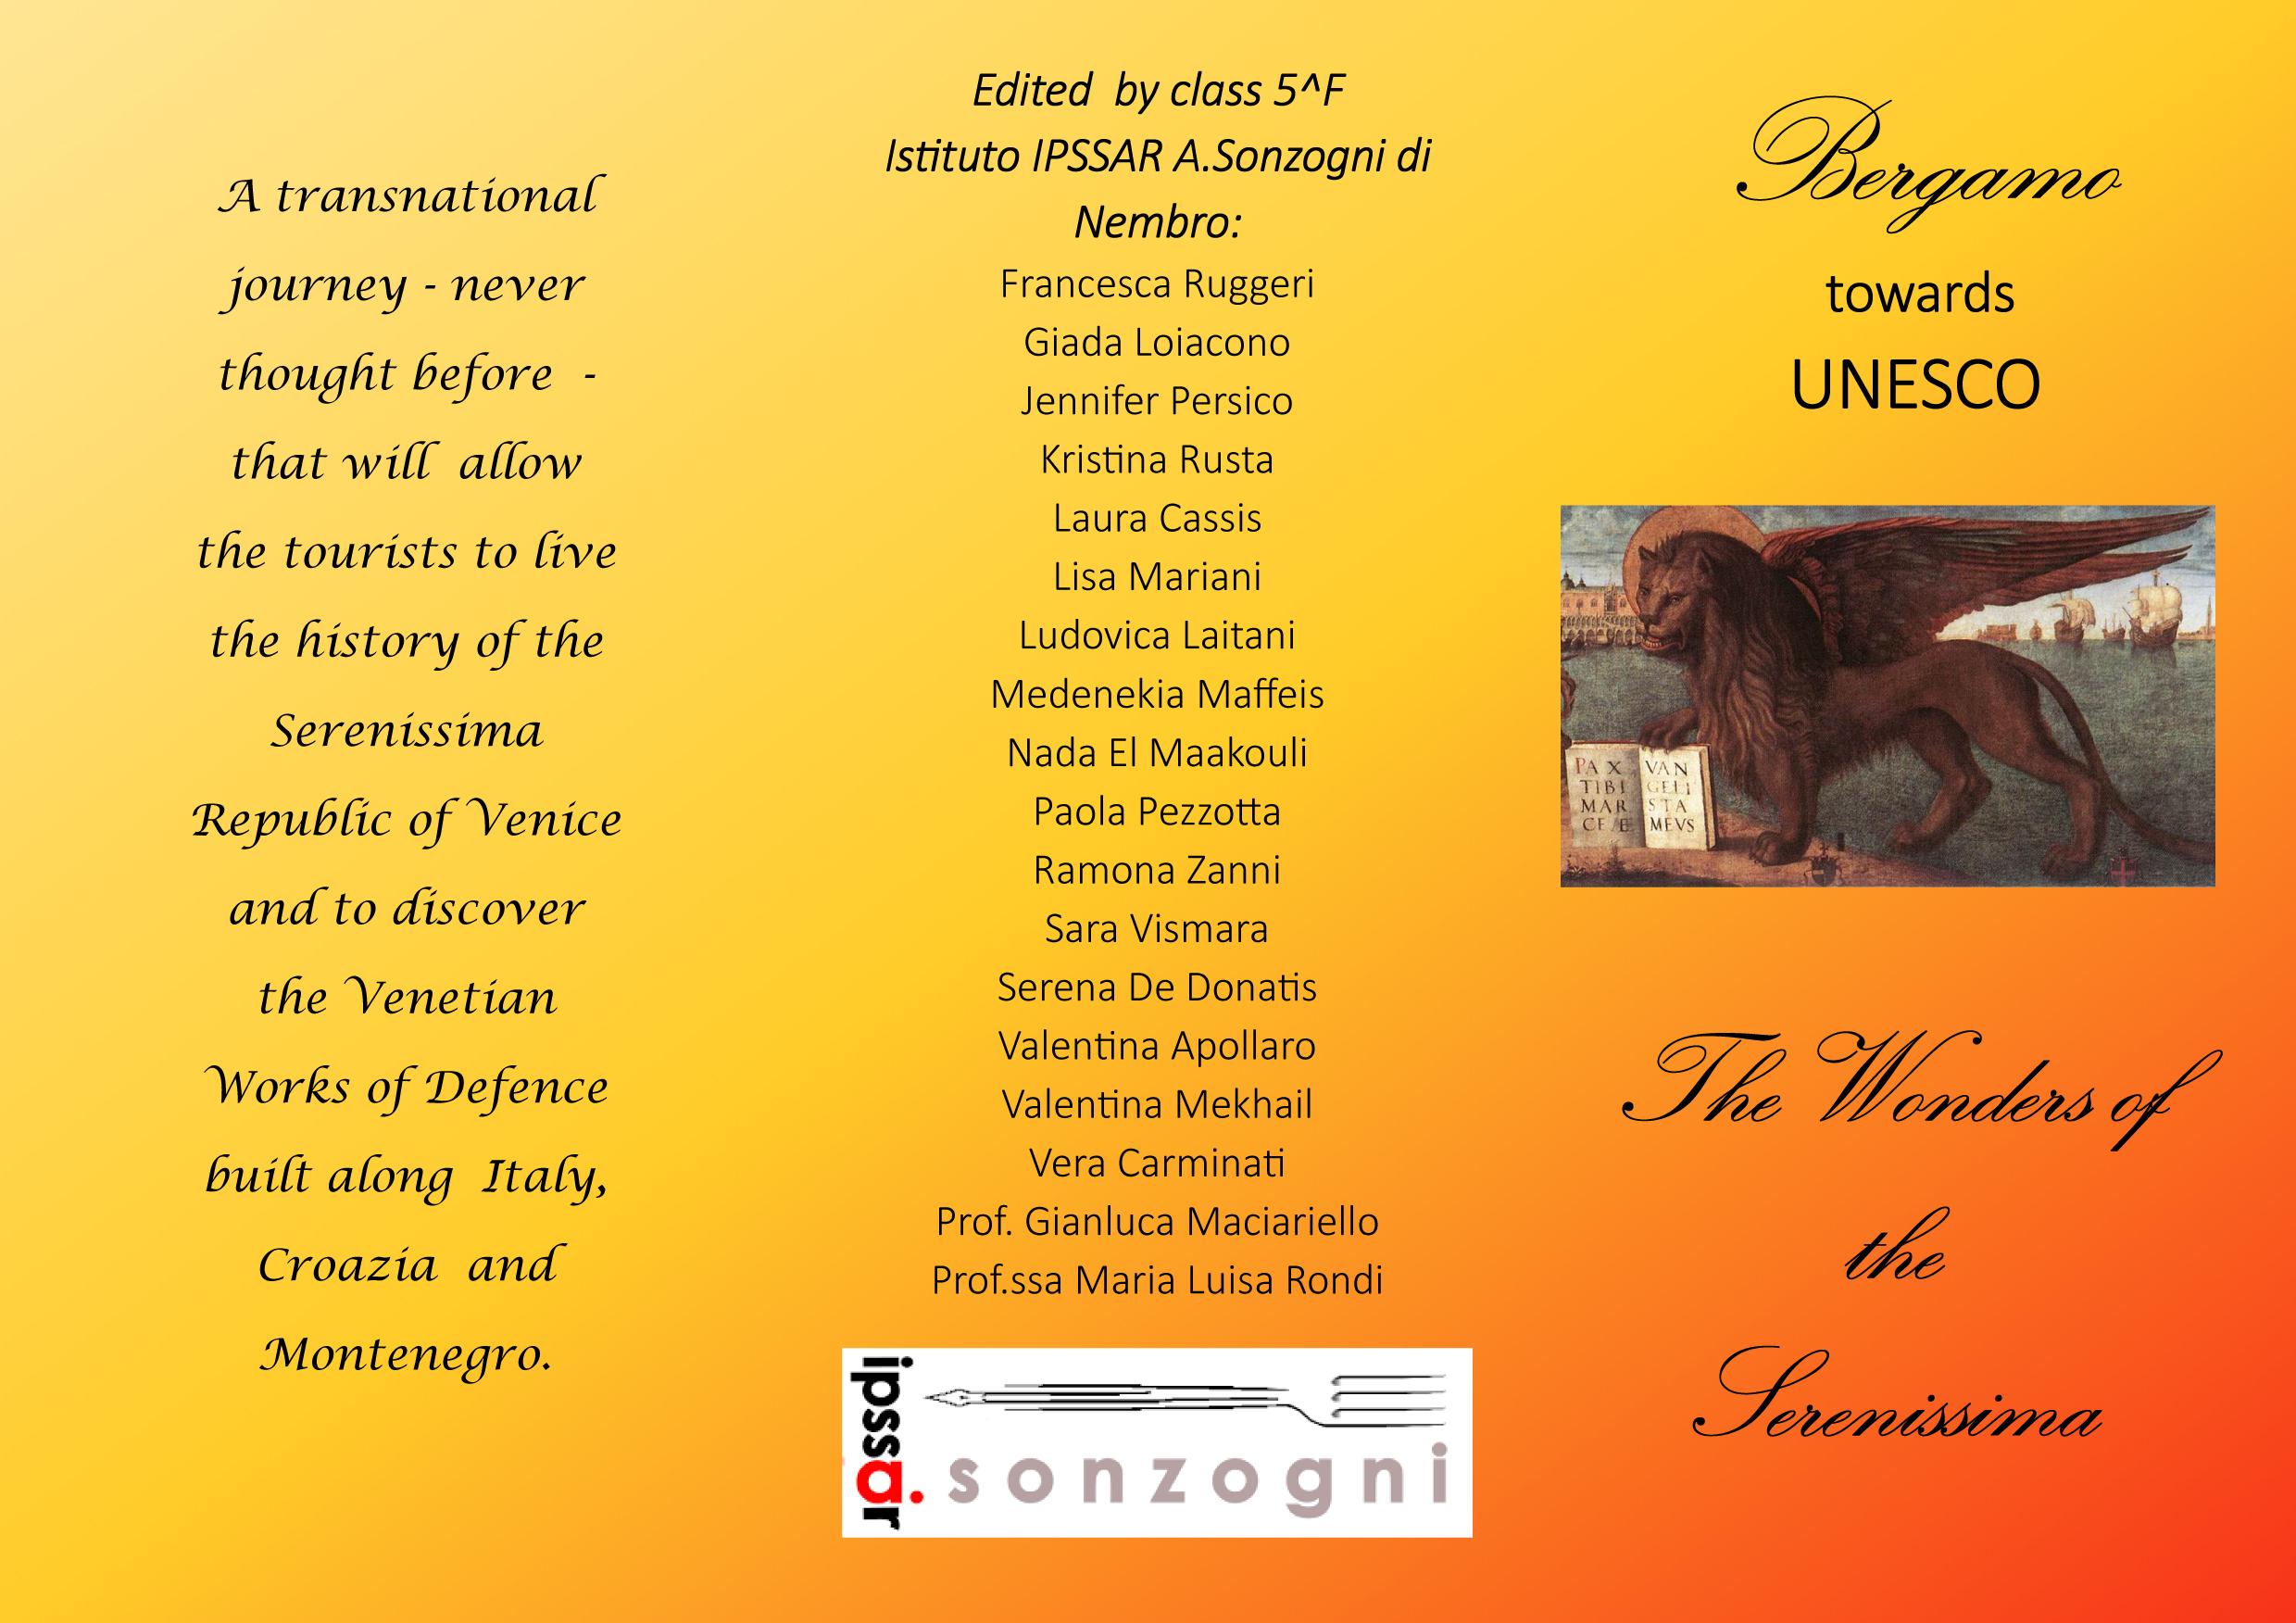 Sonzogni flyer brochure UNESCO nuovo (2) inglese.pub